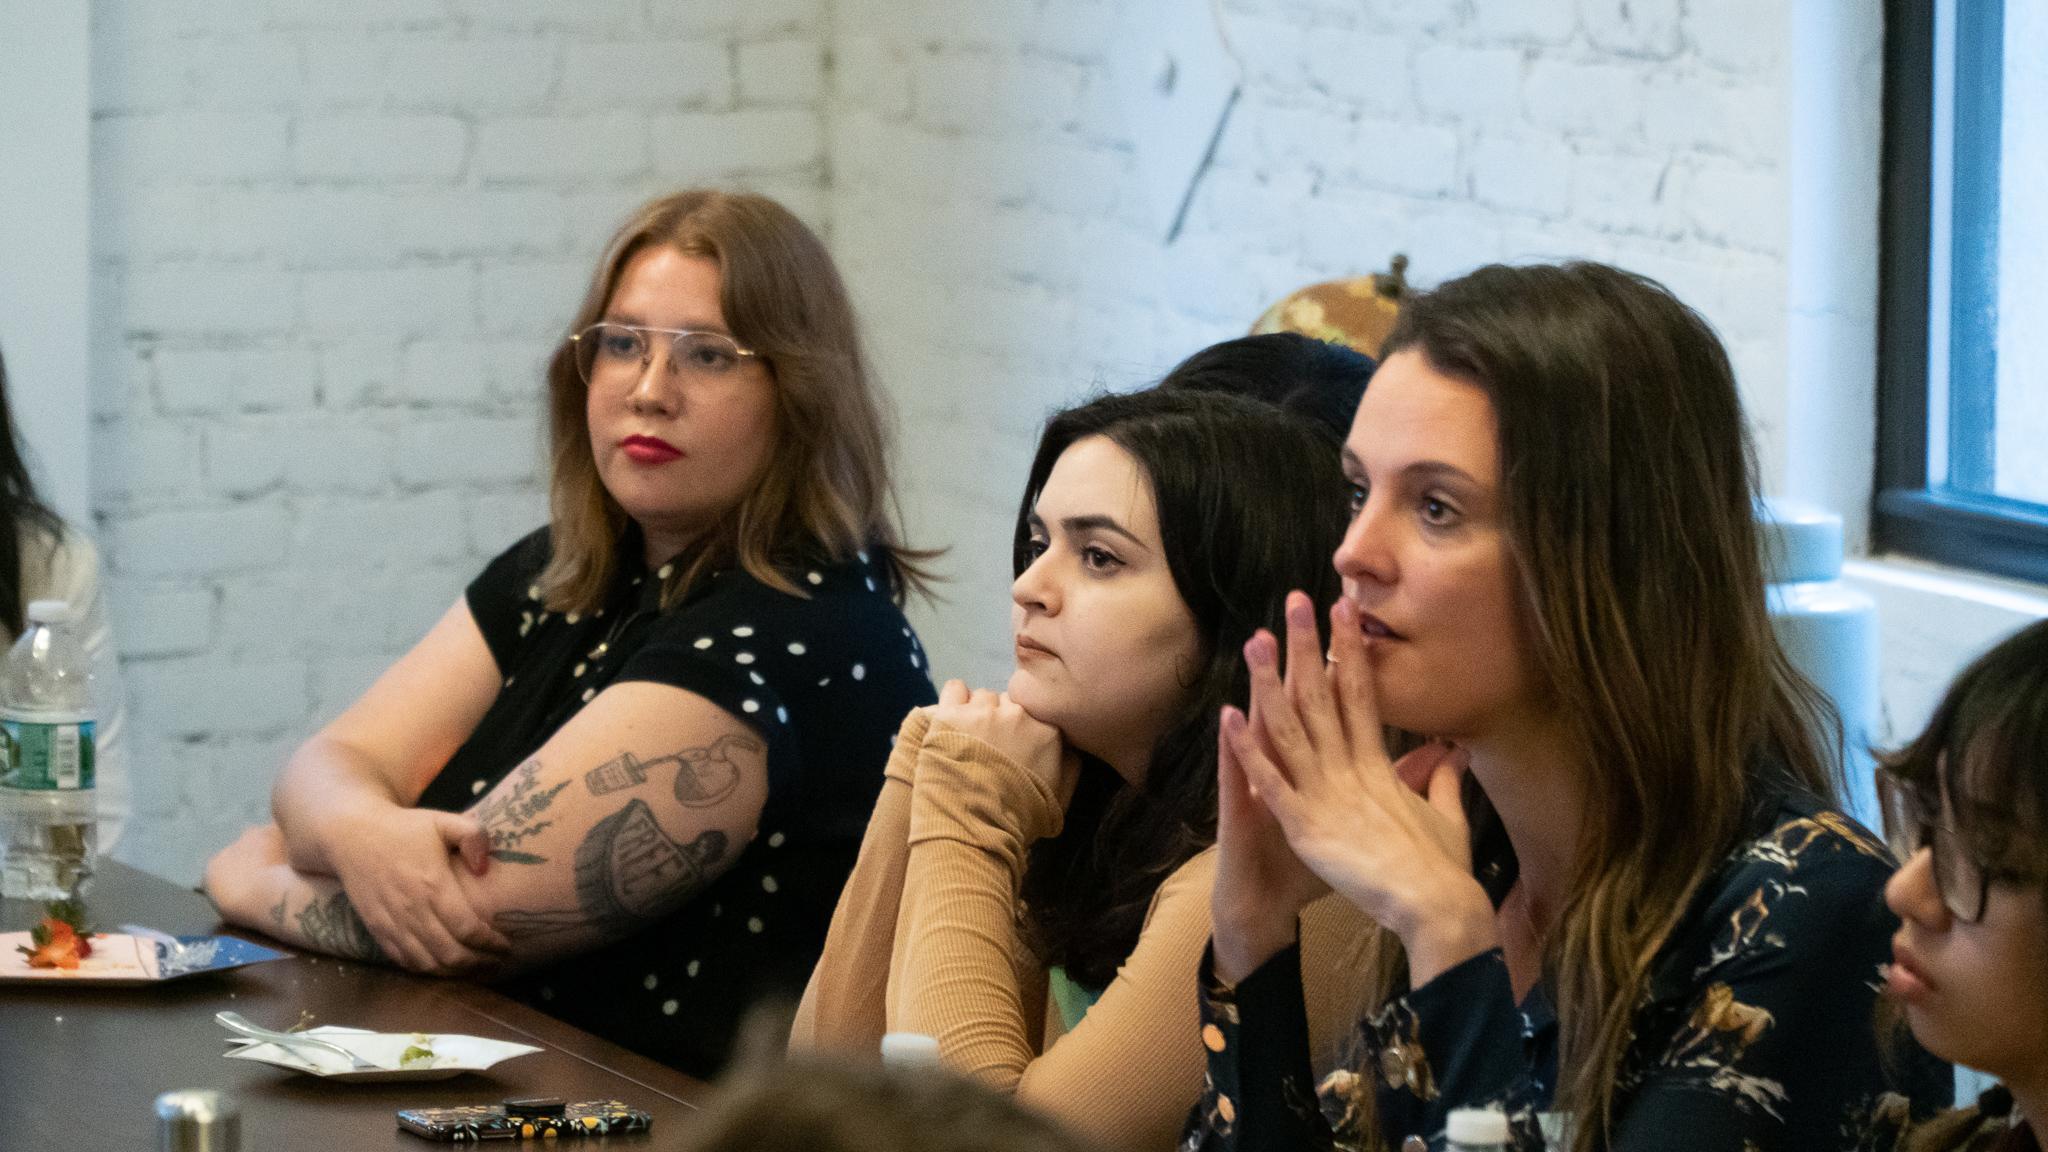 Publicist Chelsea Leibow, Alissa Medina of  Fembot , Estrella Jaramillo of  B-Wom .